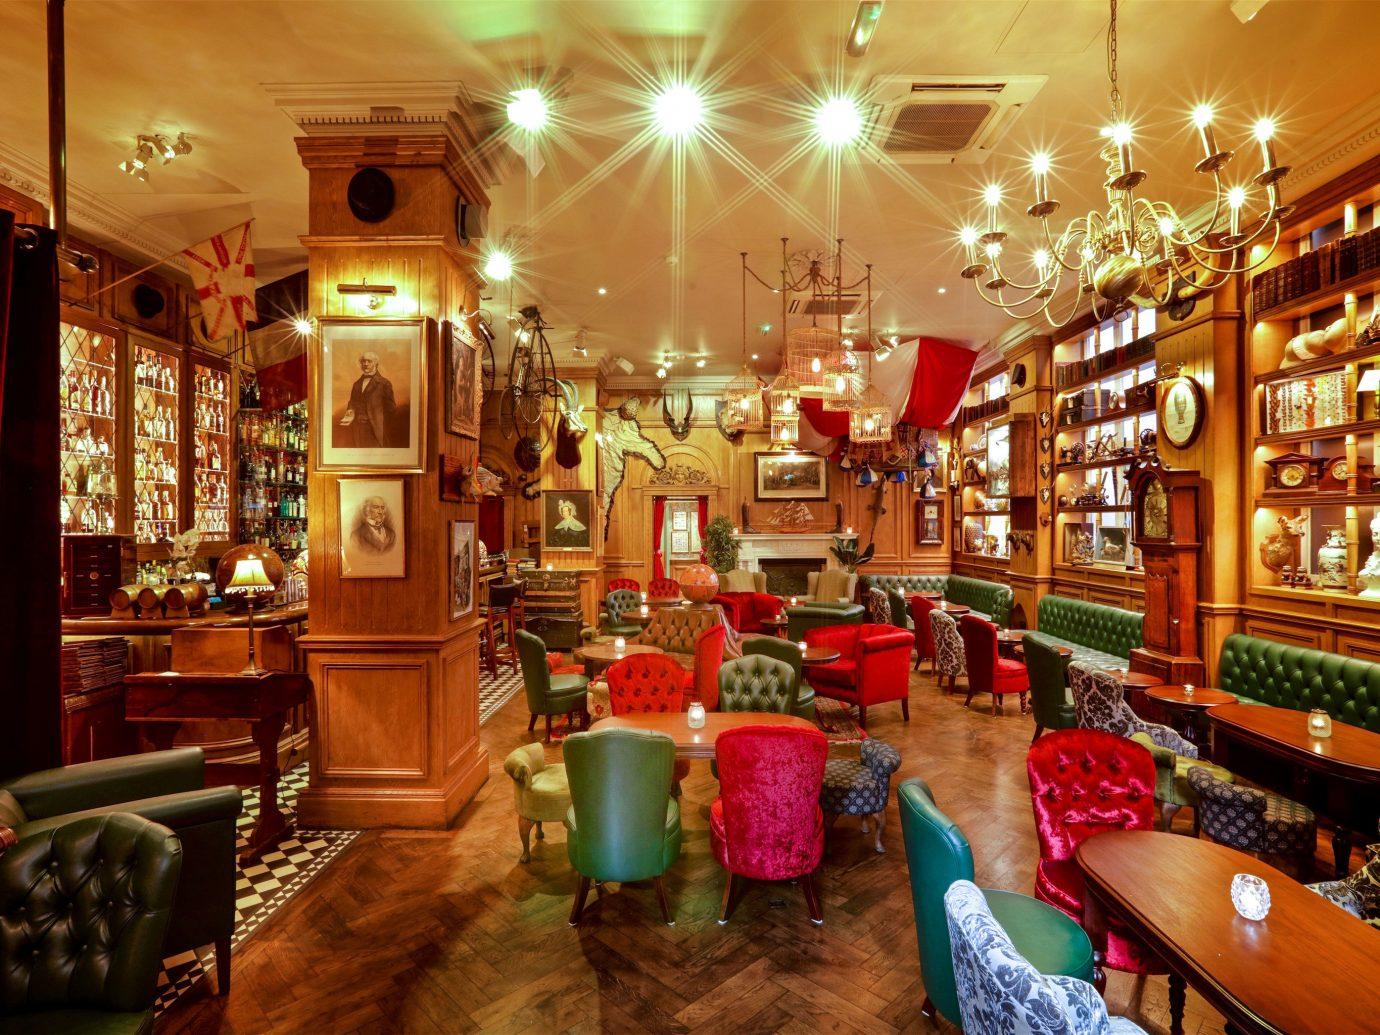 Food + Drink Trip Ideas indoor interior design Bar restaurant cluttered several